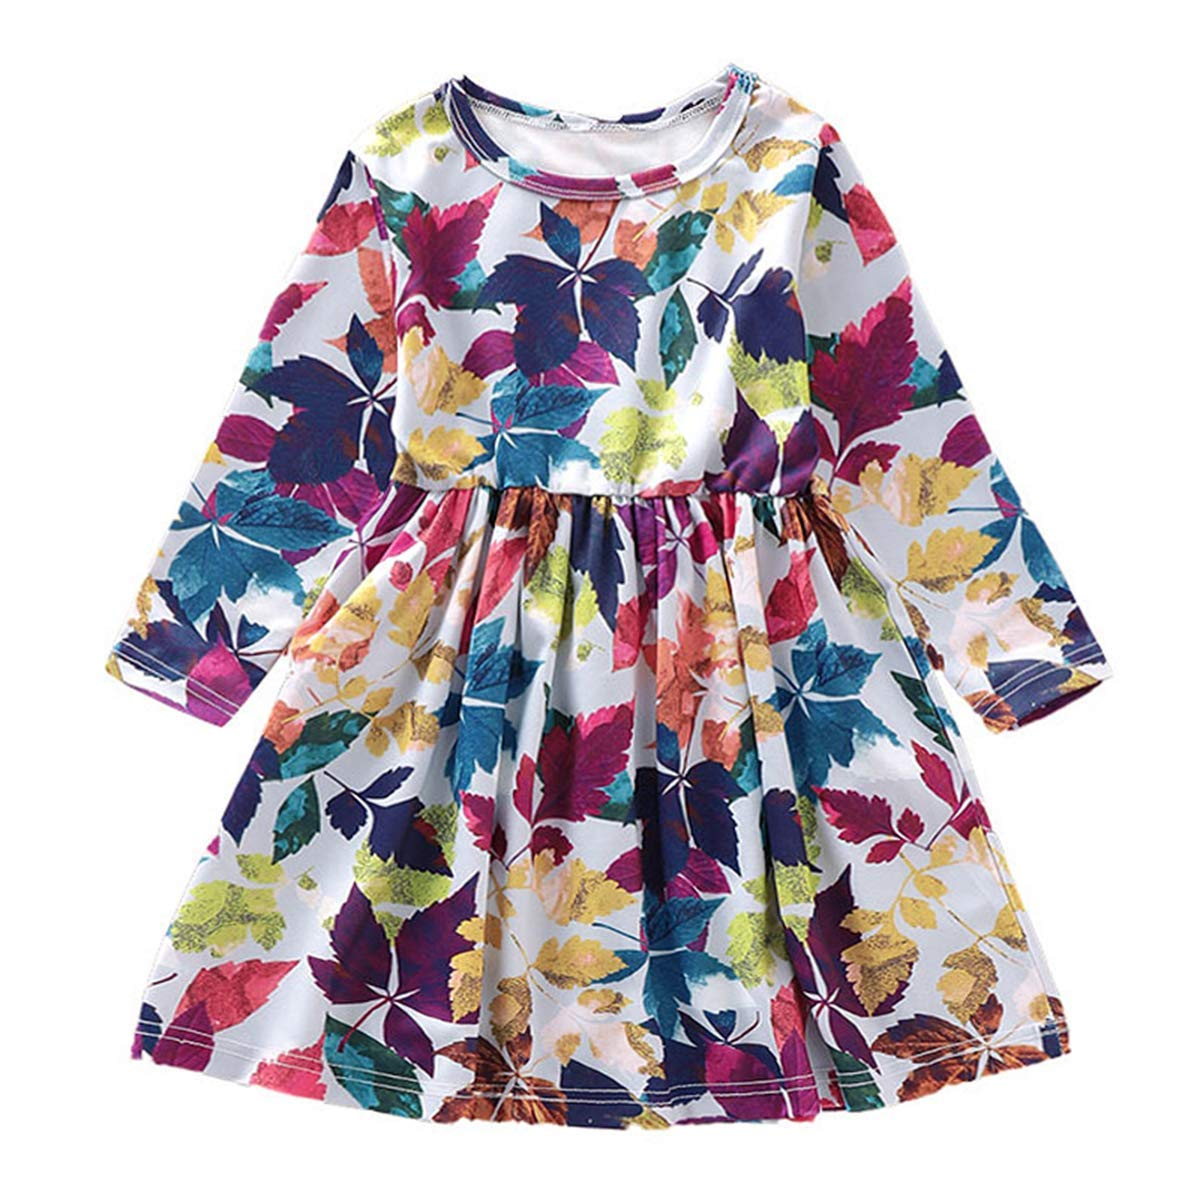 Toddler Baby Girl Clothes Denim Ruffle Sunflower Dress Long Sleeve Floral Skirt Outfit Princess Sundress